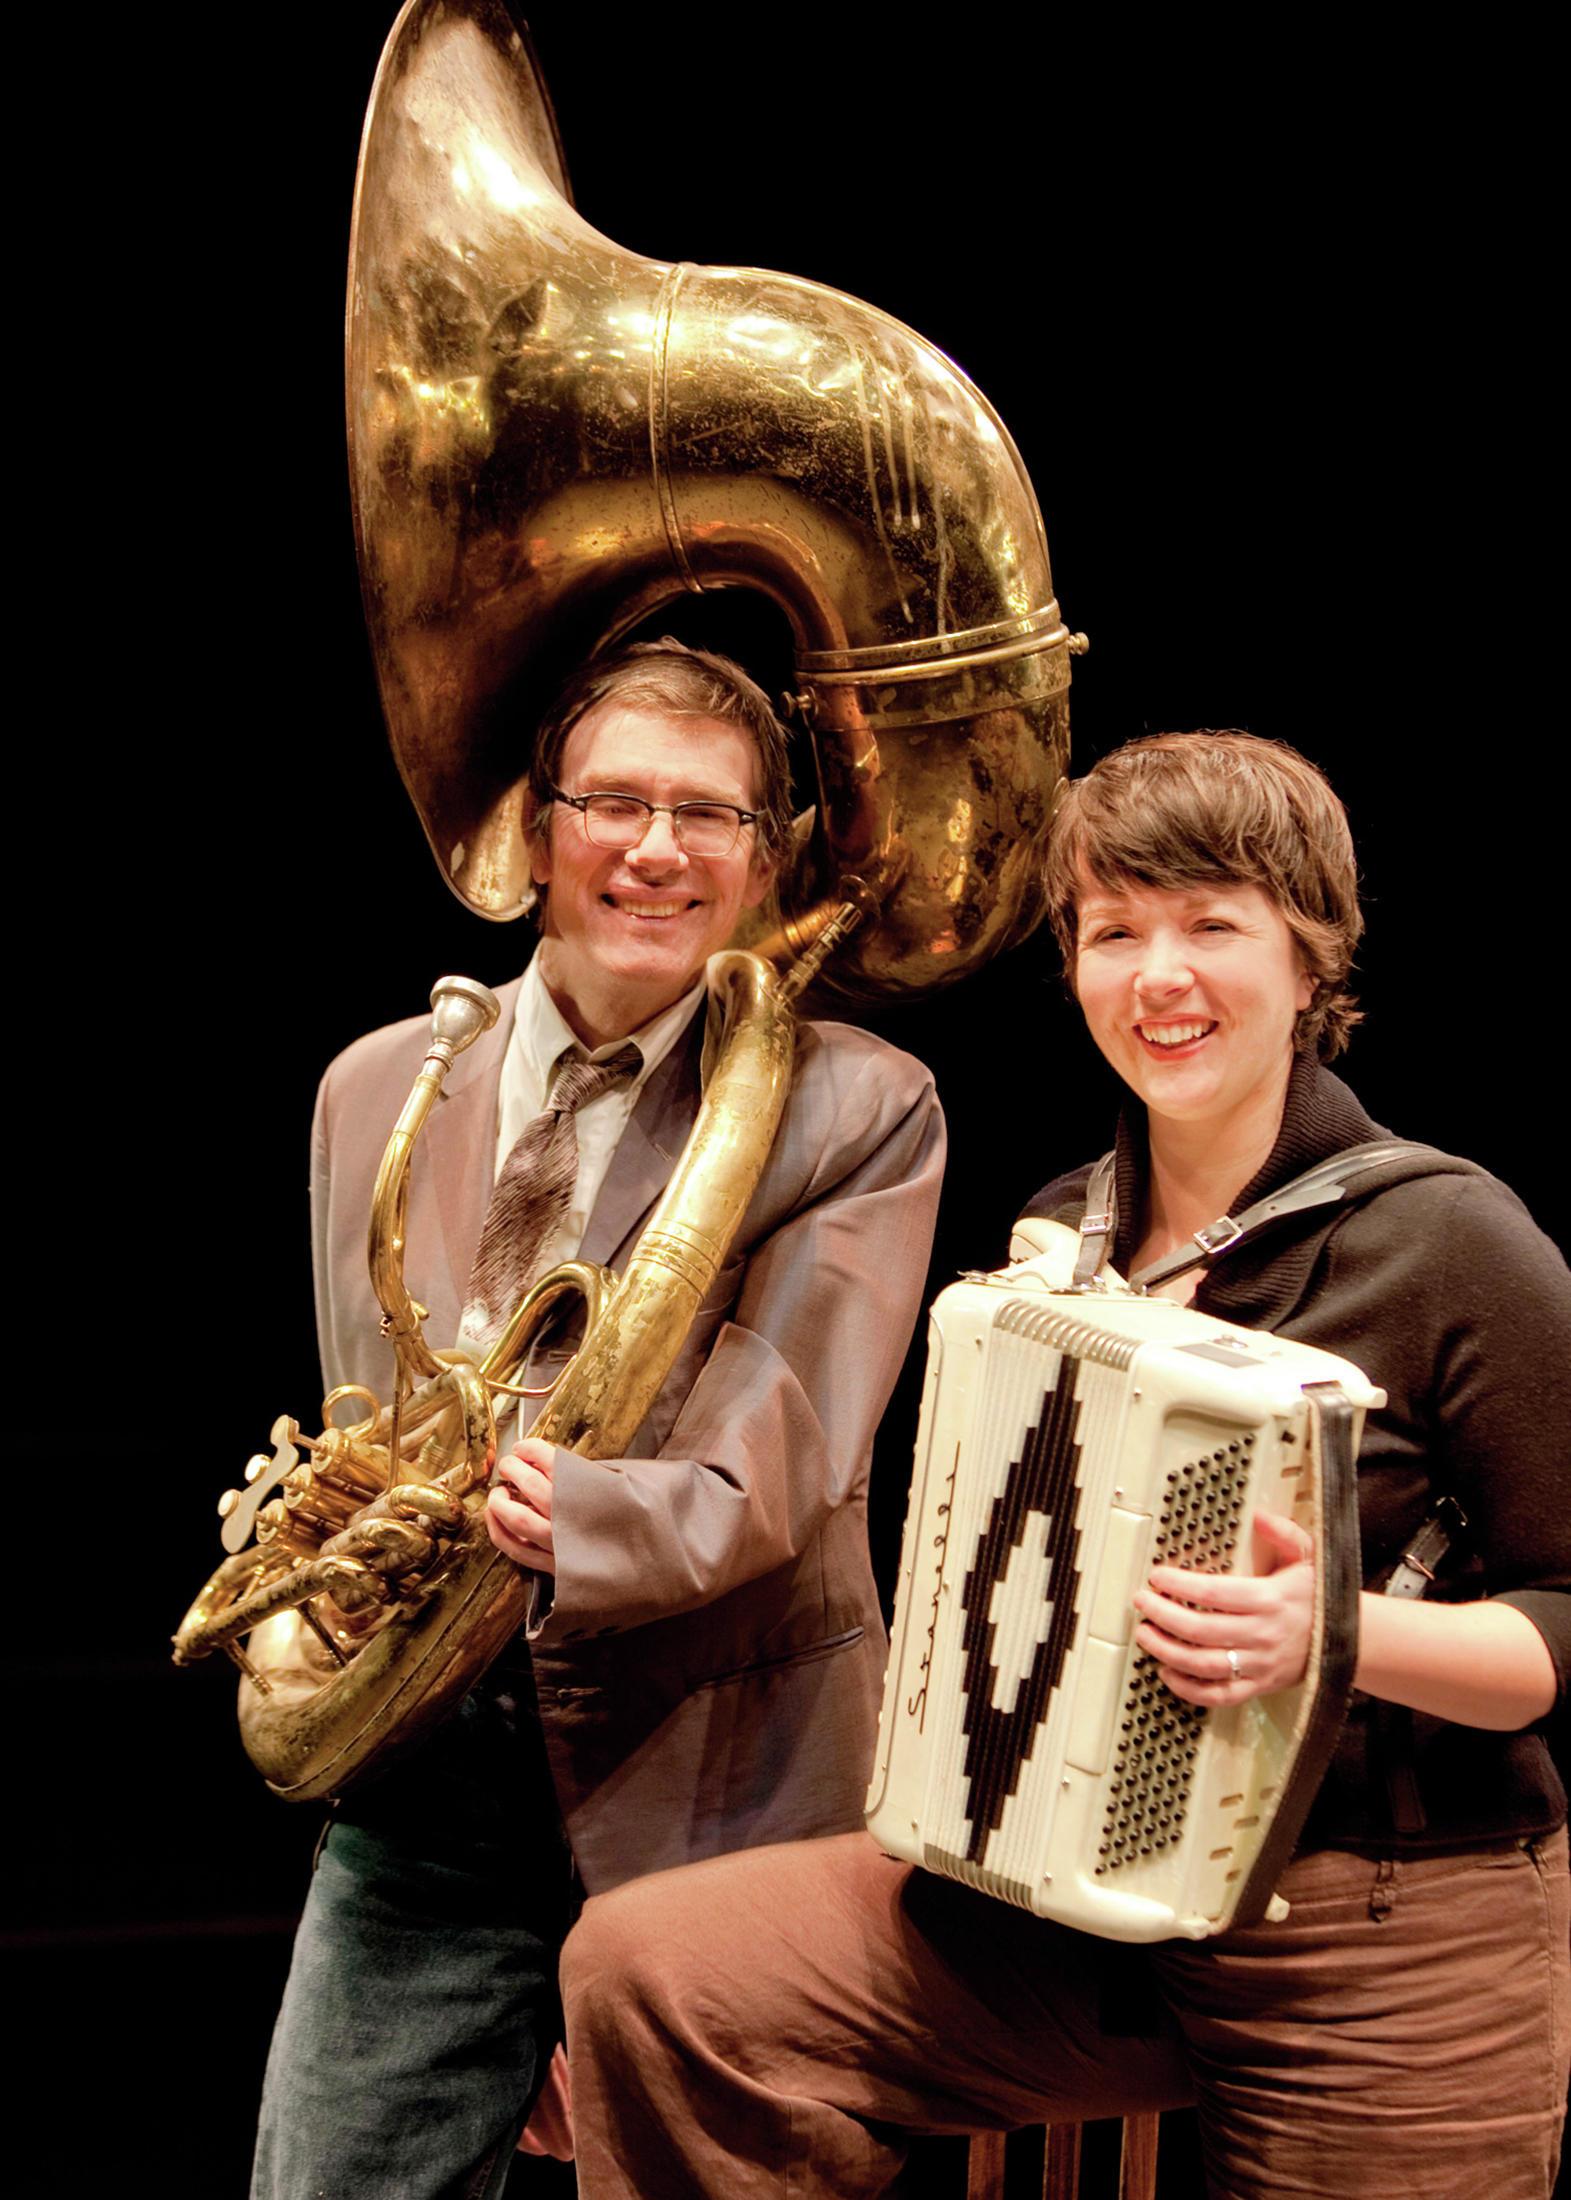 5-16-20 Kevin Kling & Simone Perrin